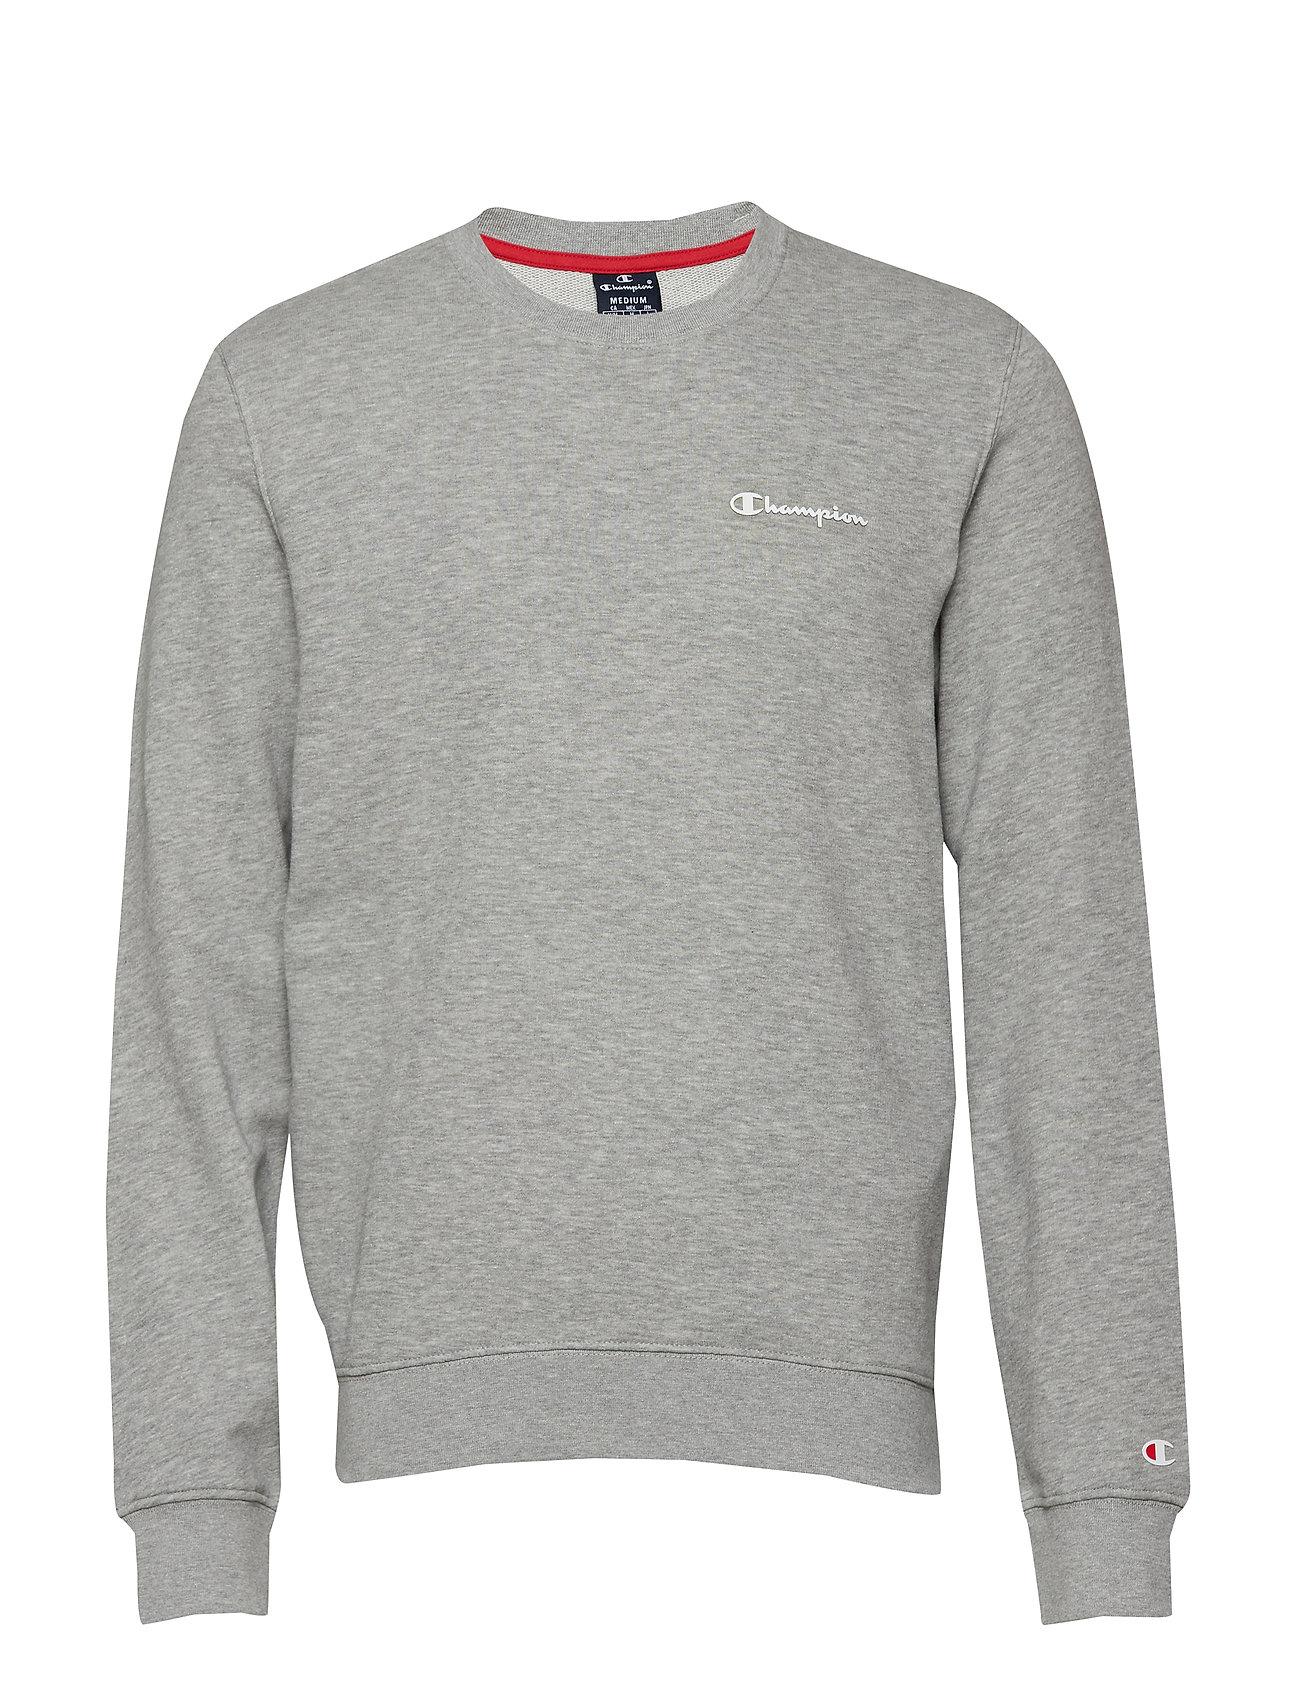 Champion Crewneck Sweatshirt - GRAY MELANGE LIGHT